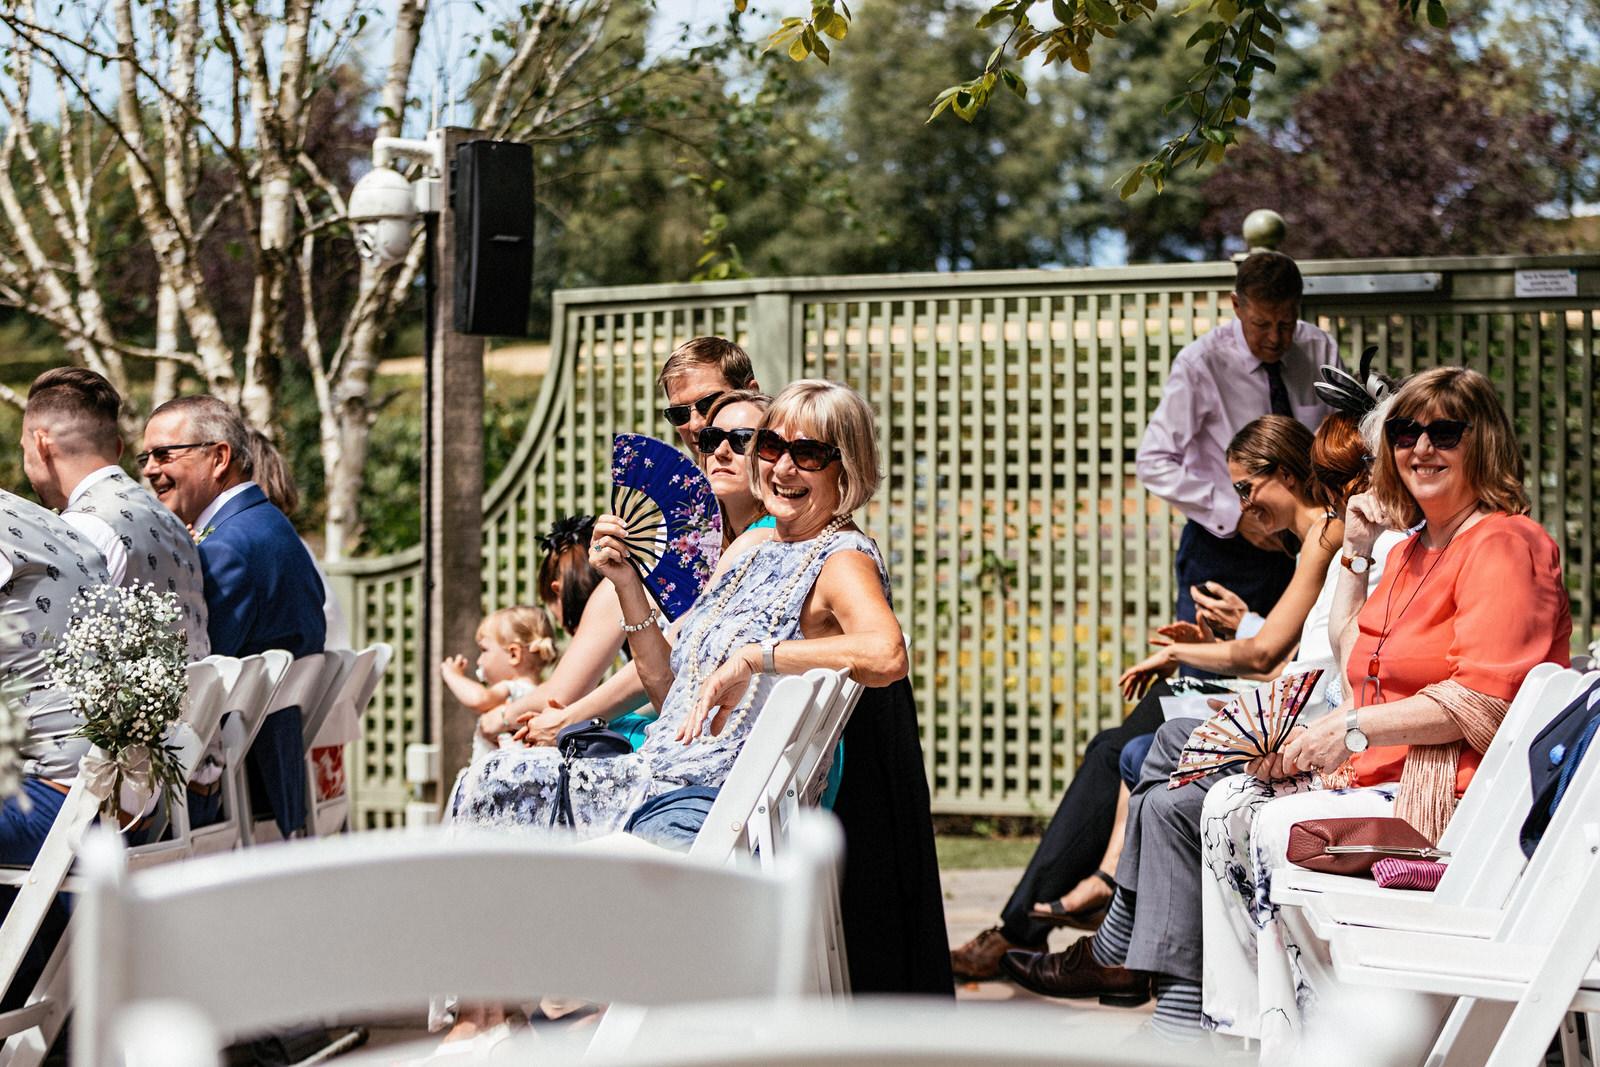 Moddershall-Oaks-Spa-Wedding-Photographer-015.jpg